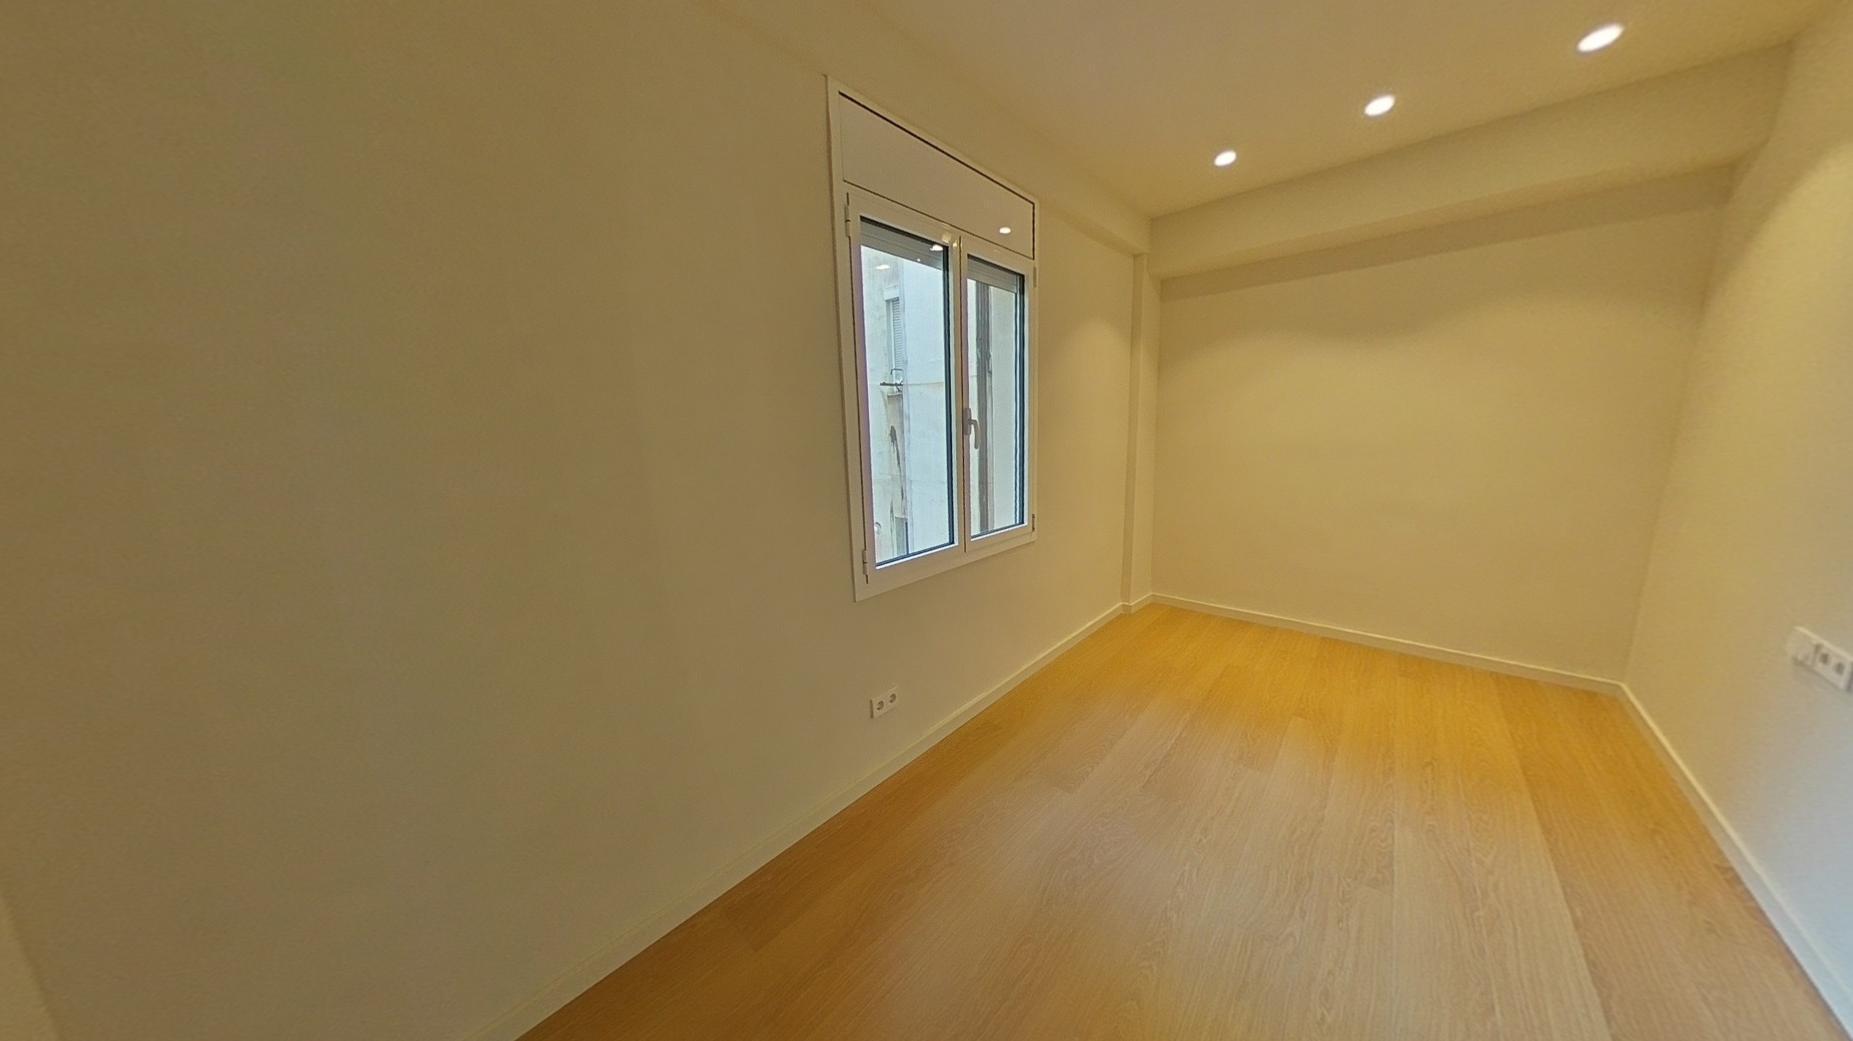 253492 Flat for sale in Sarrià-Sant Gervasi, Sant Gervasi-Galvany 34